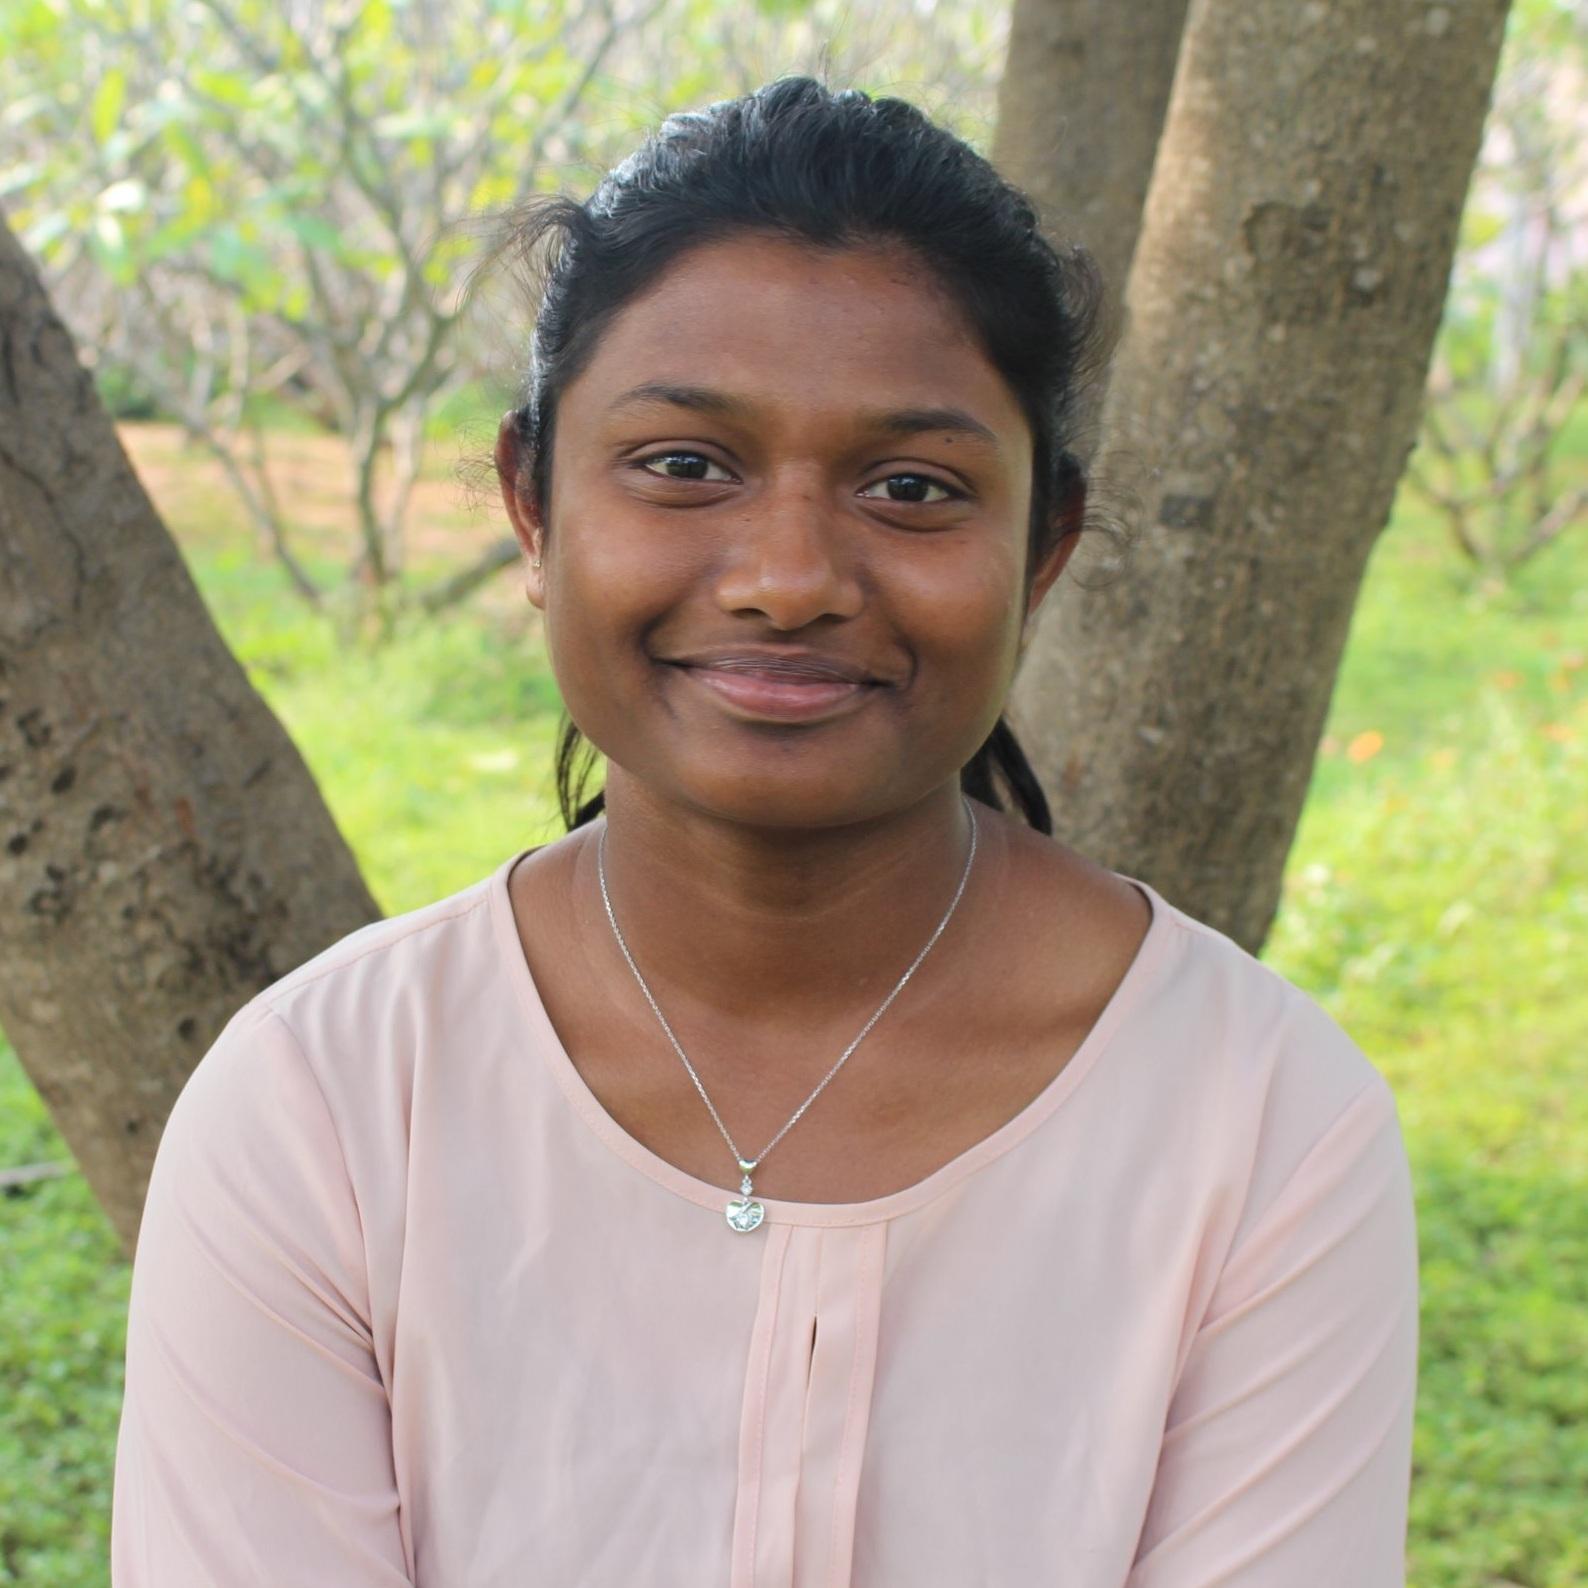 Visali, India